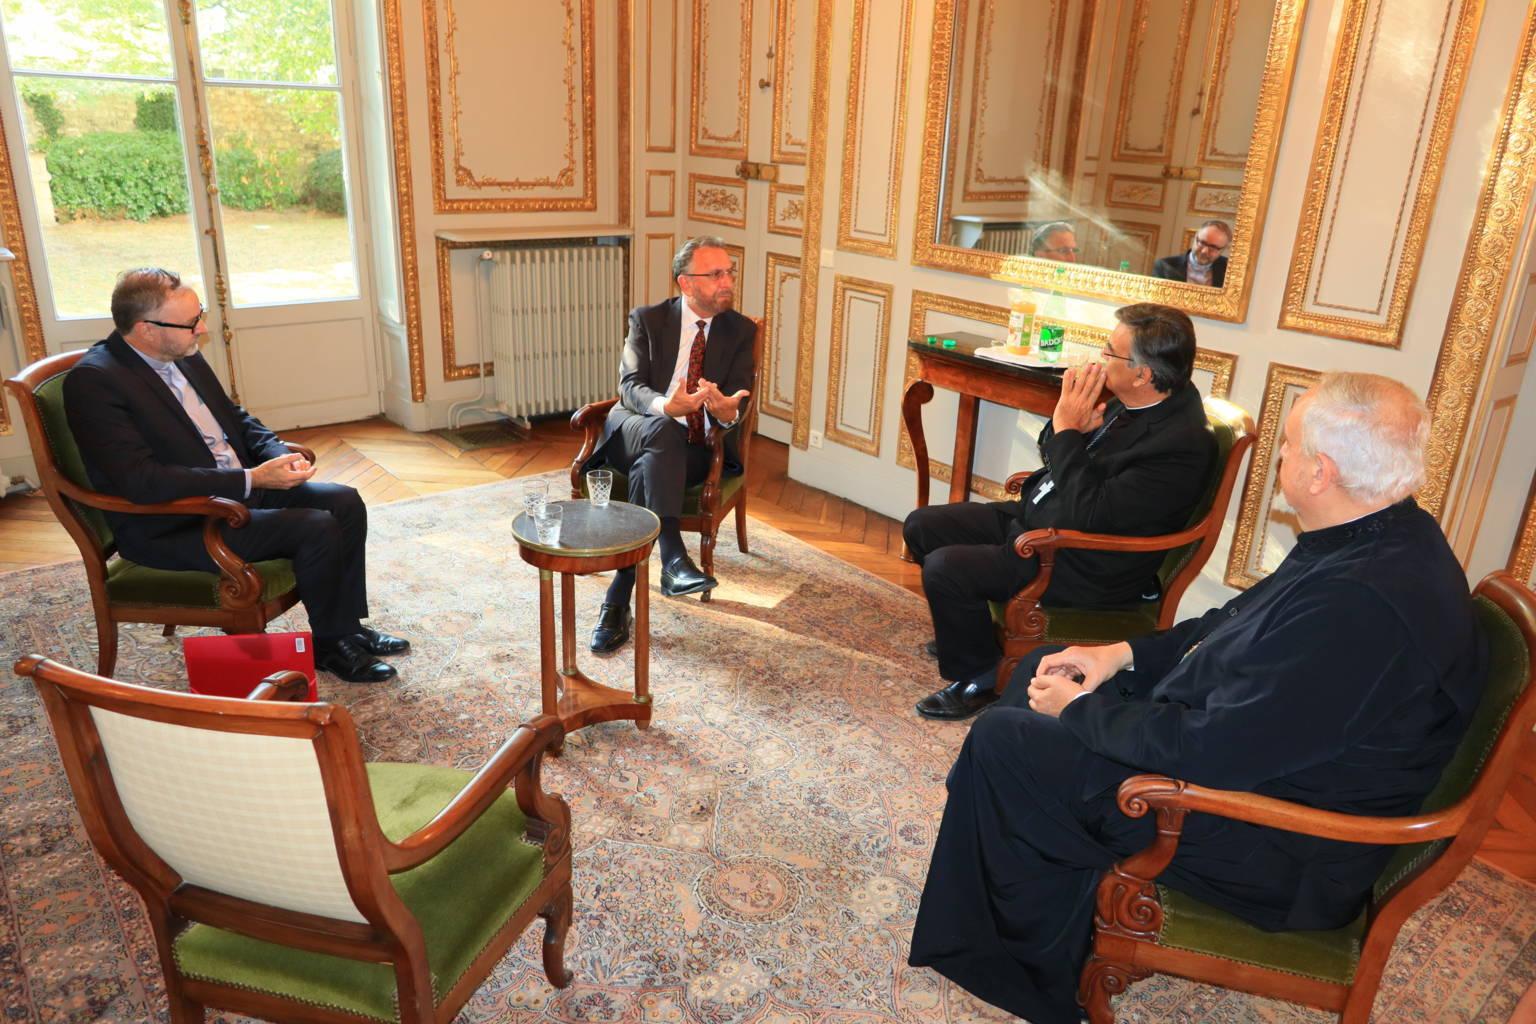 IMG 0304 - Συνάντηση του Μητροπολίτη Γαλλίας με τον ΡωμαιοκαθολικόΑρχιεπίσκοπο Παρισίων